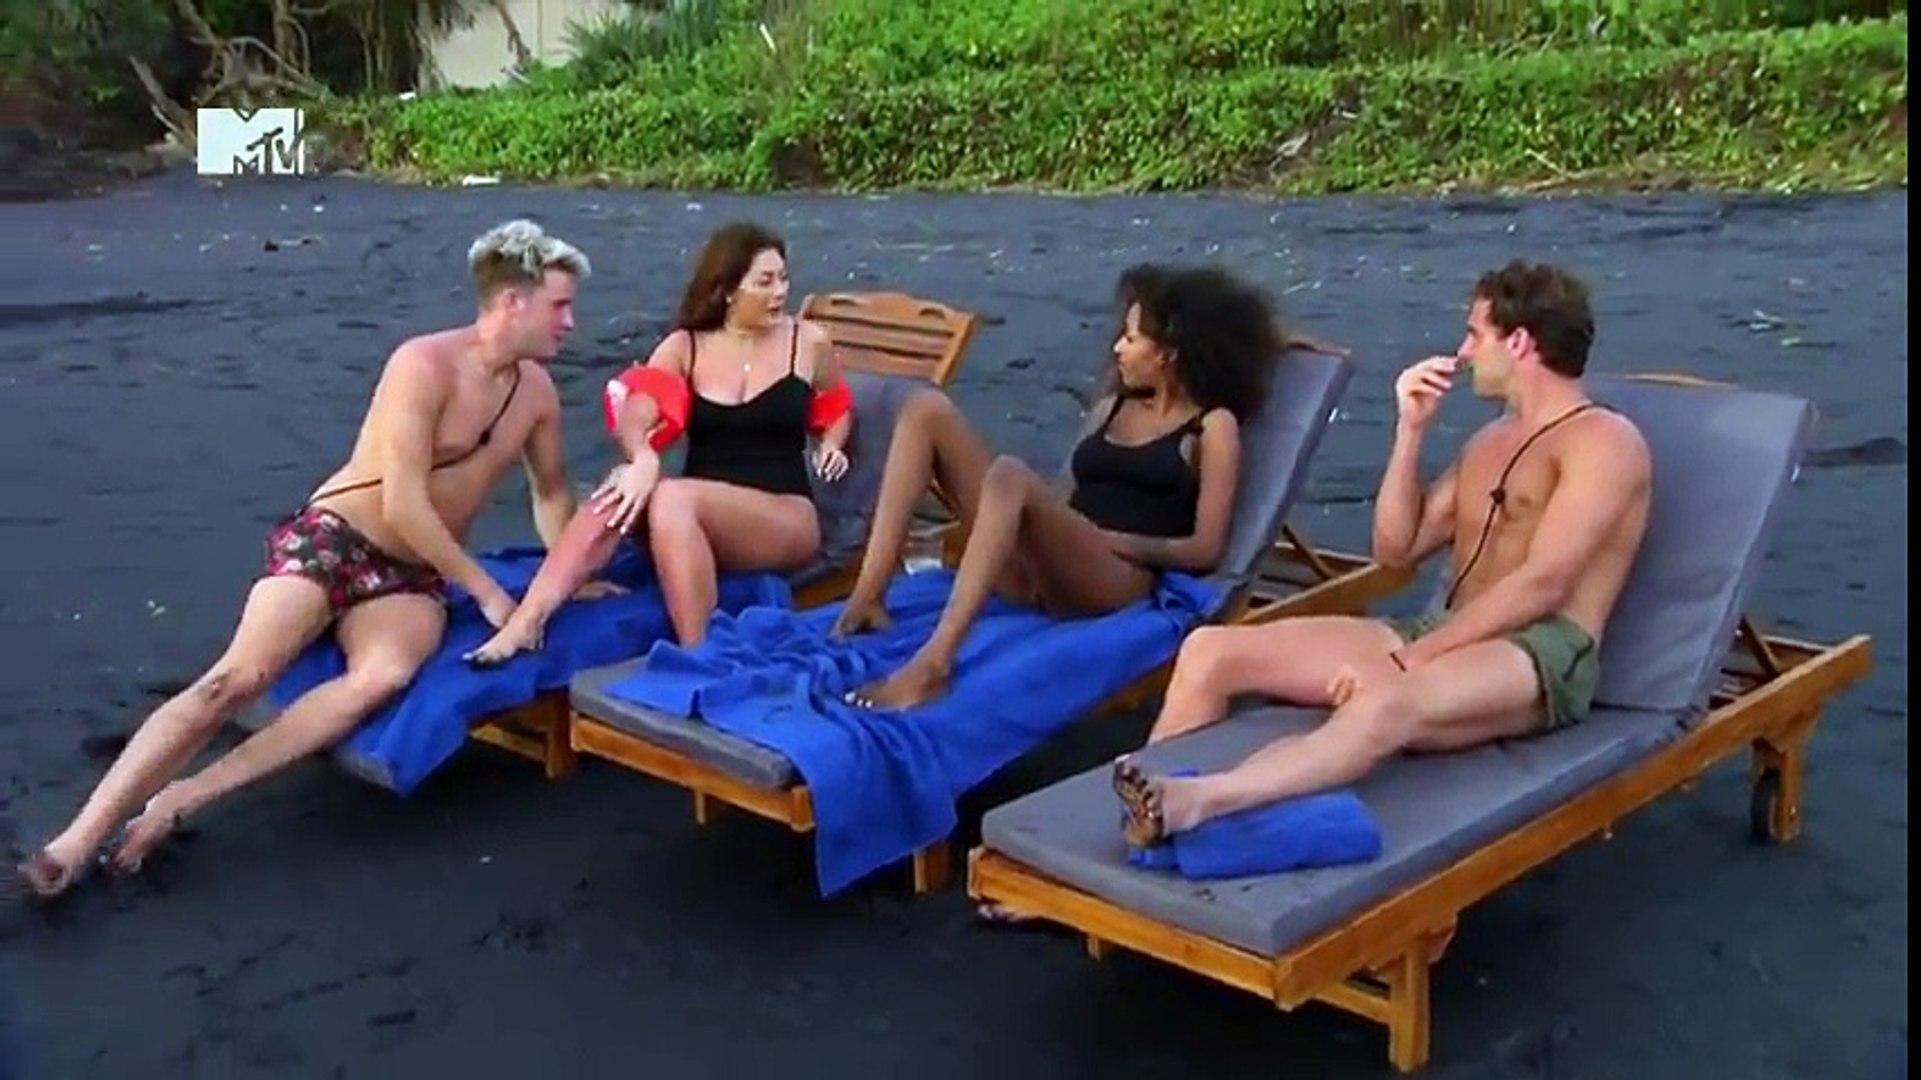 Ex On The Beach Season 7 Episode 02 Full Episode Video Dailymotion